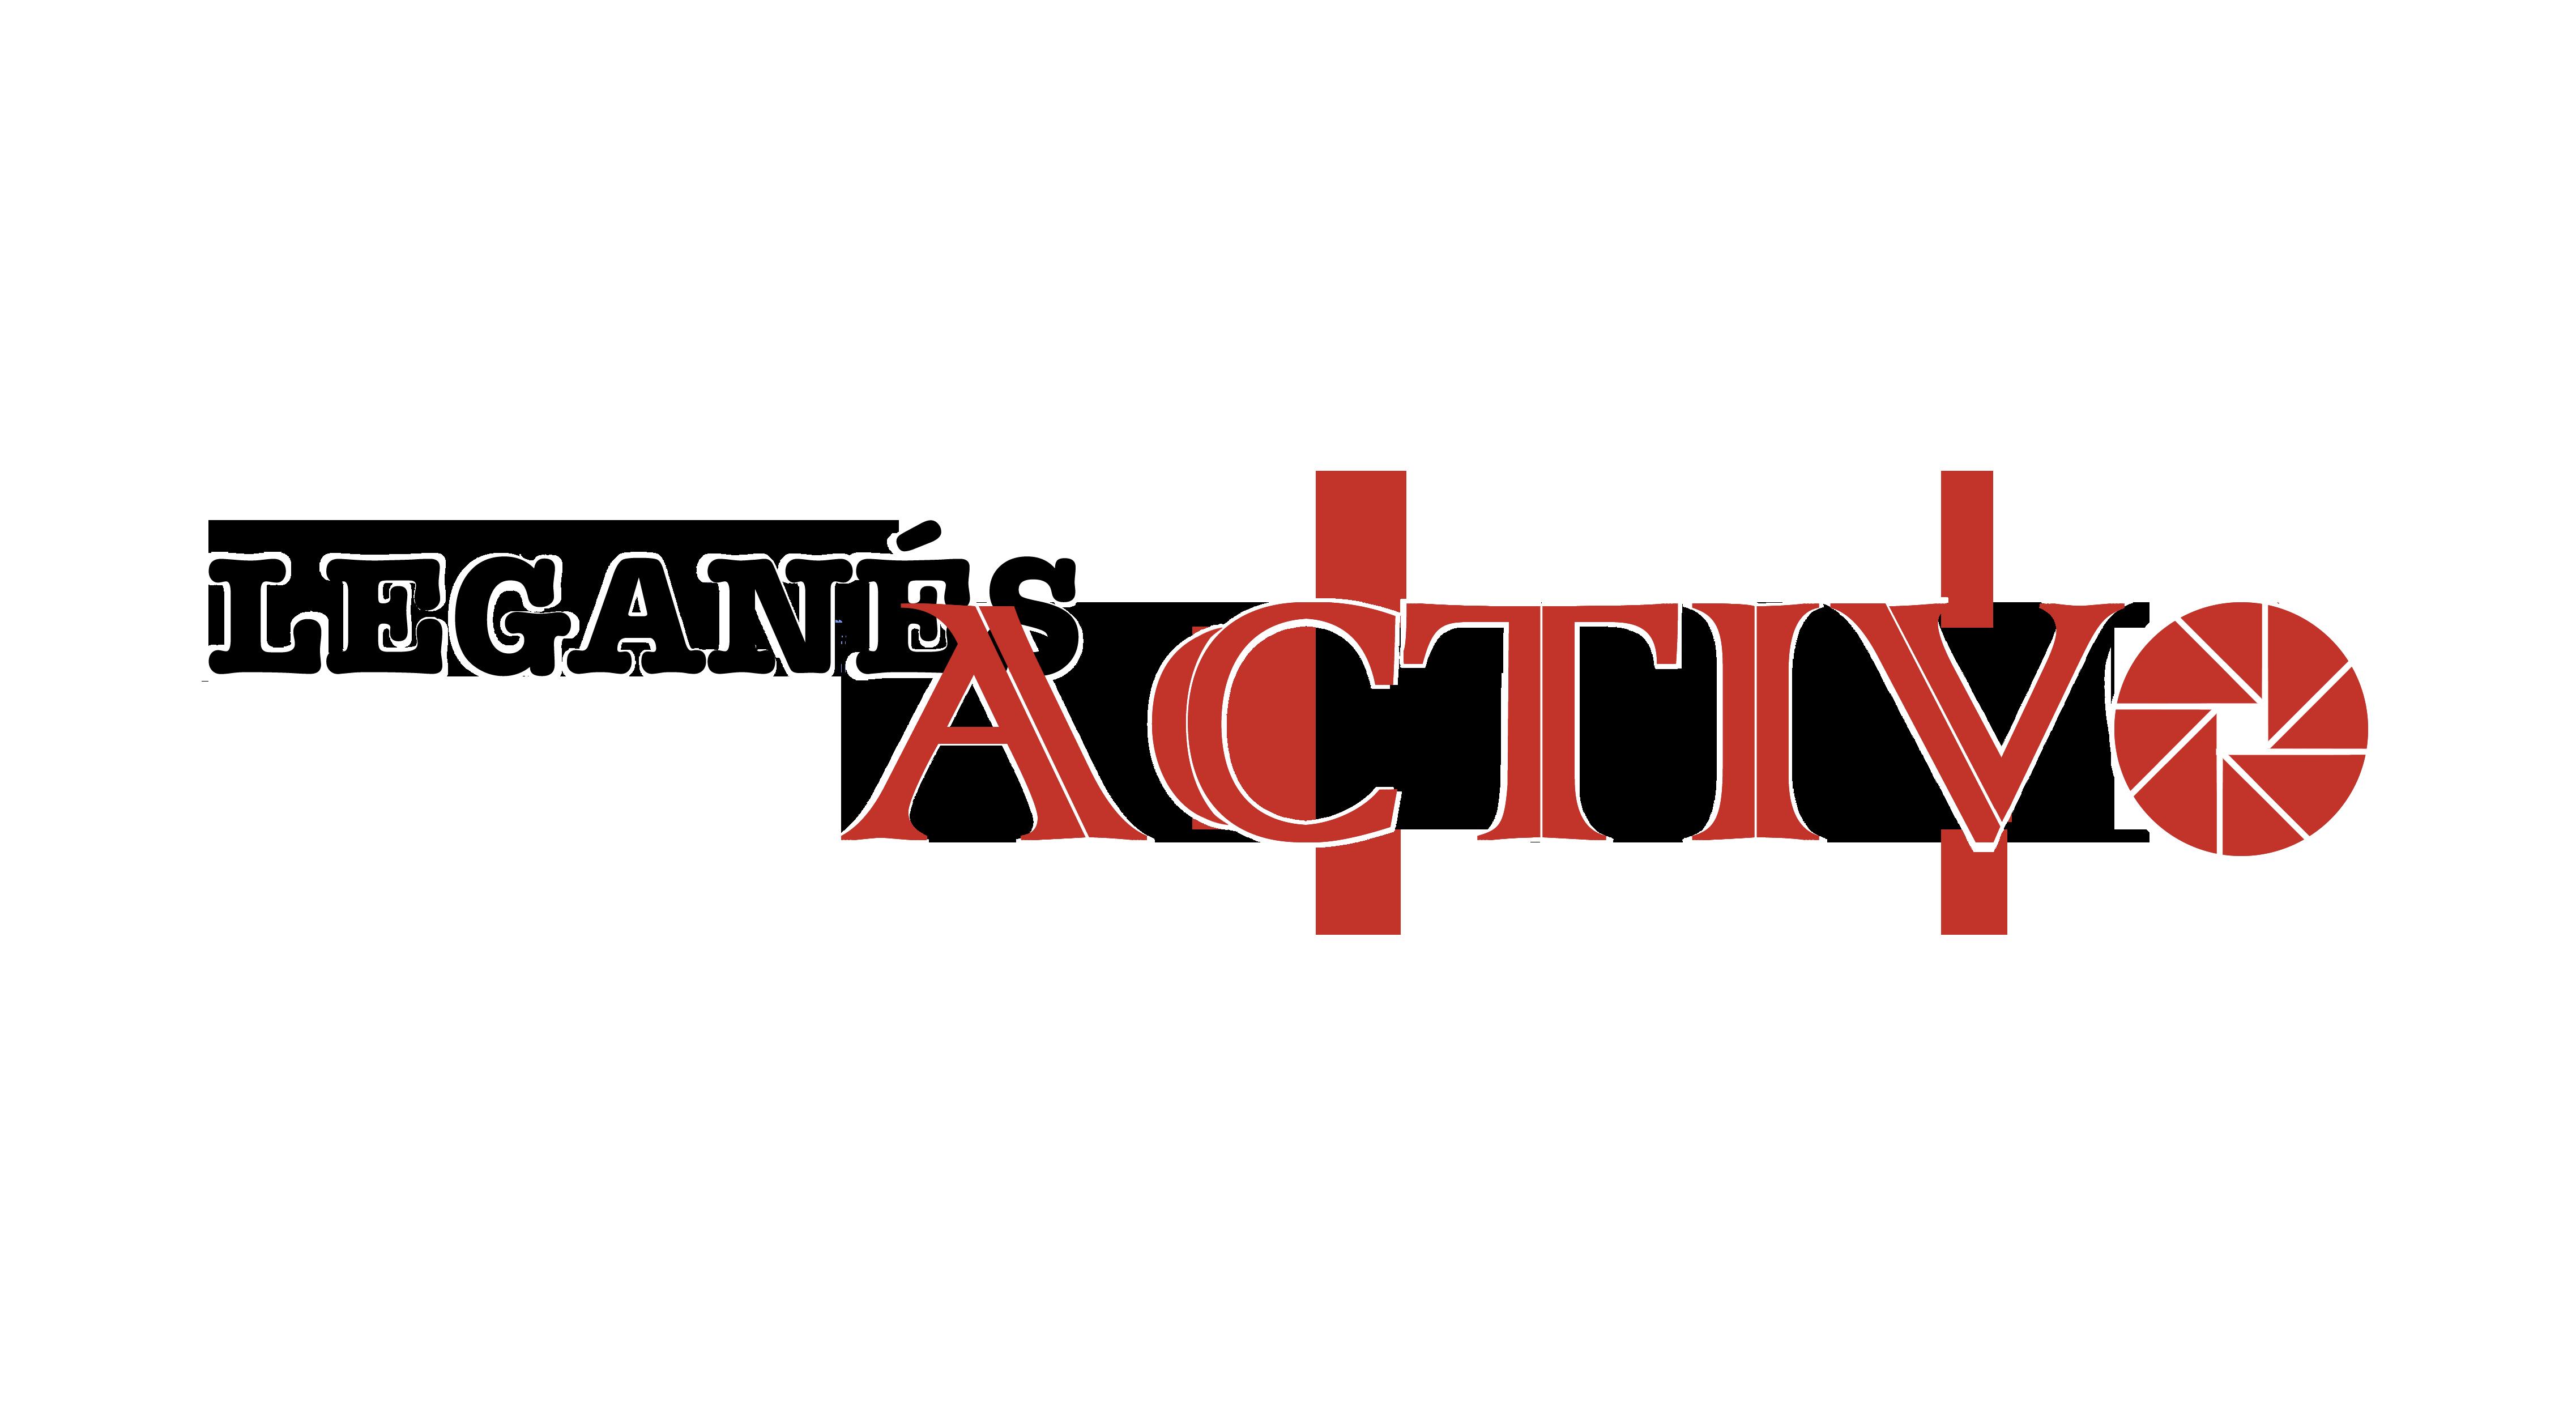 Leganés Activo